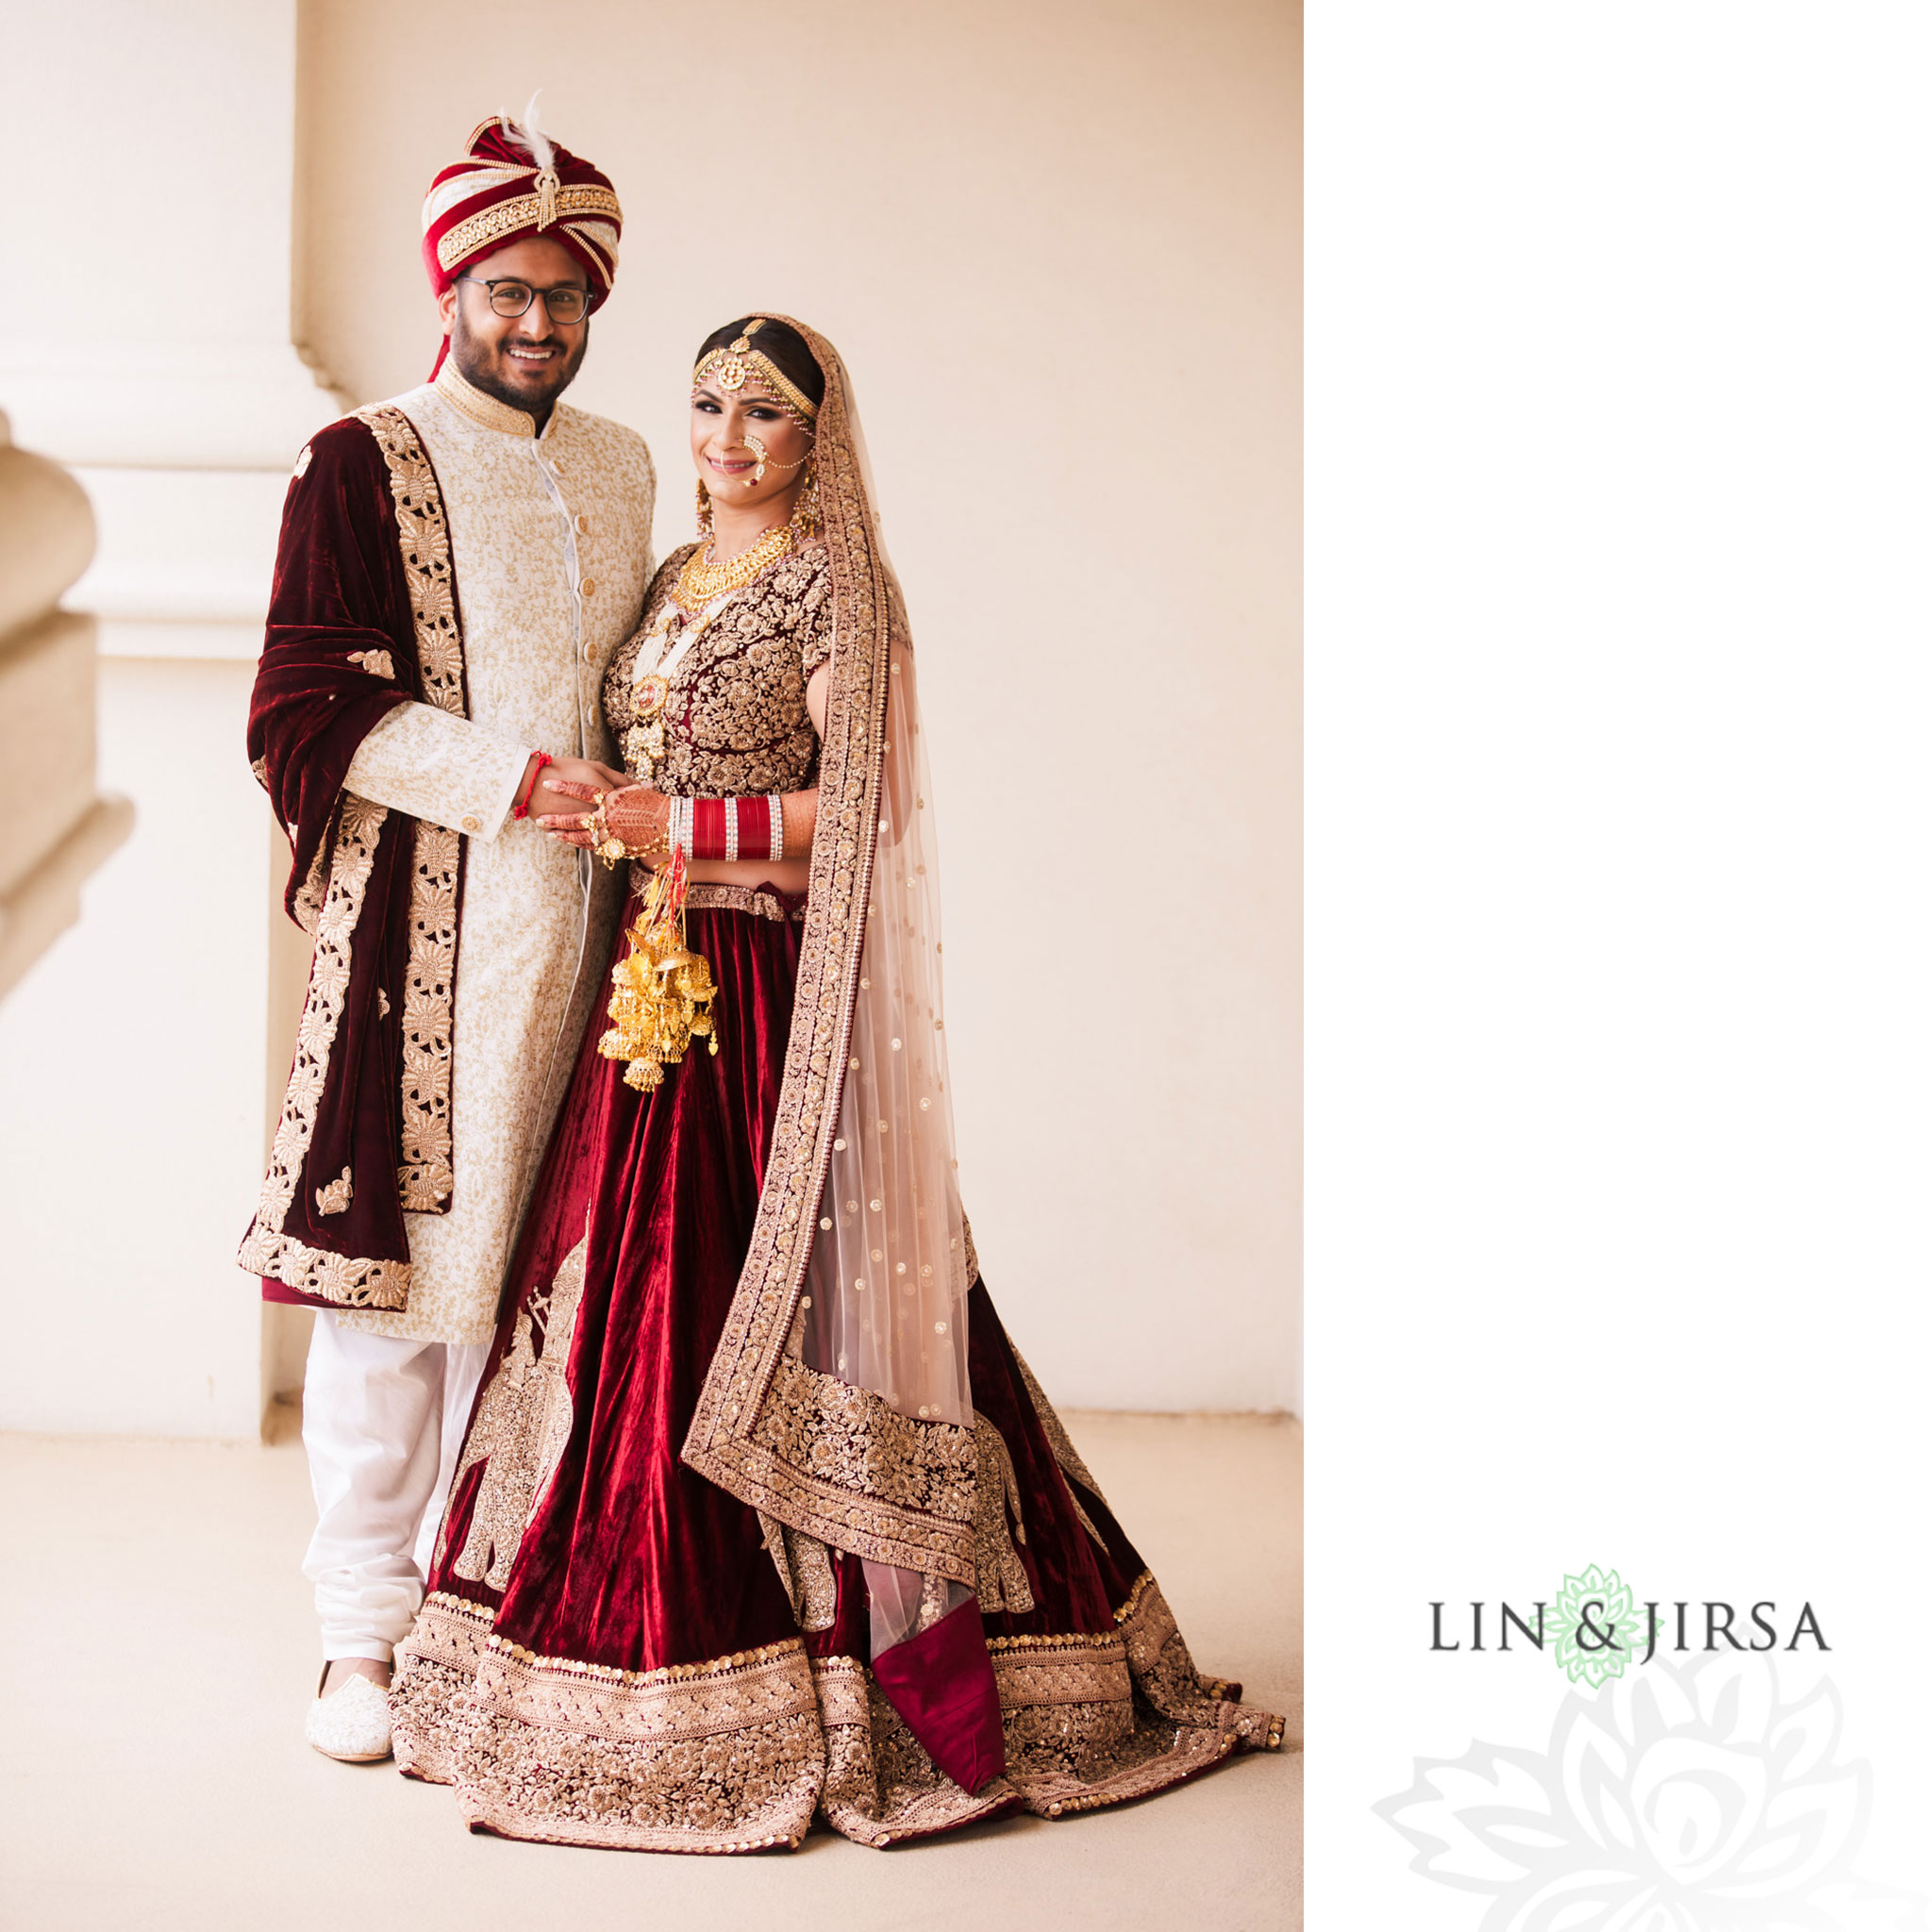 11 monarch beach resort dana point indian bride groom wedding photography